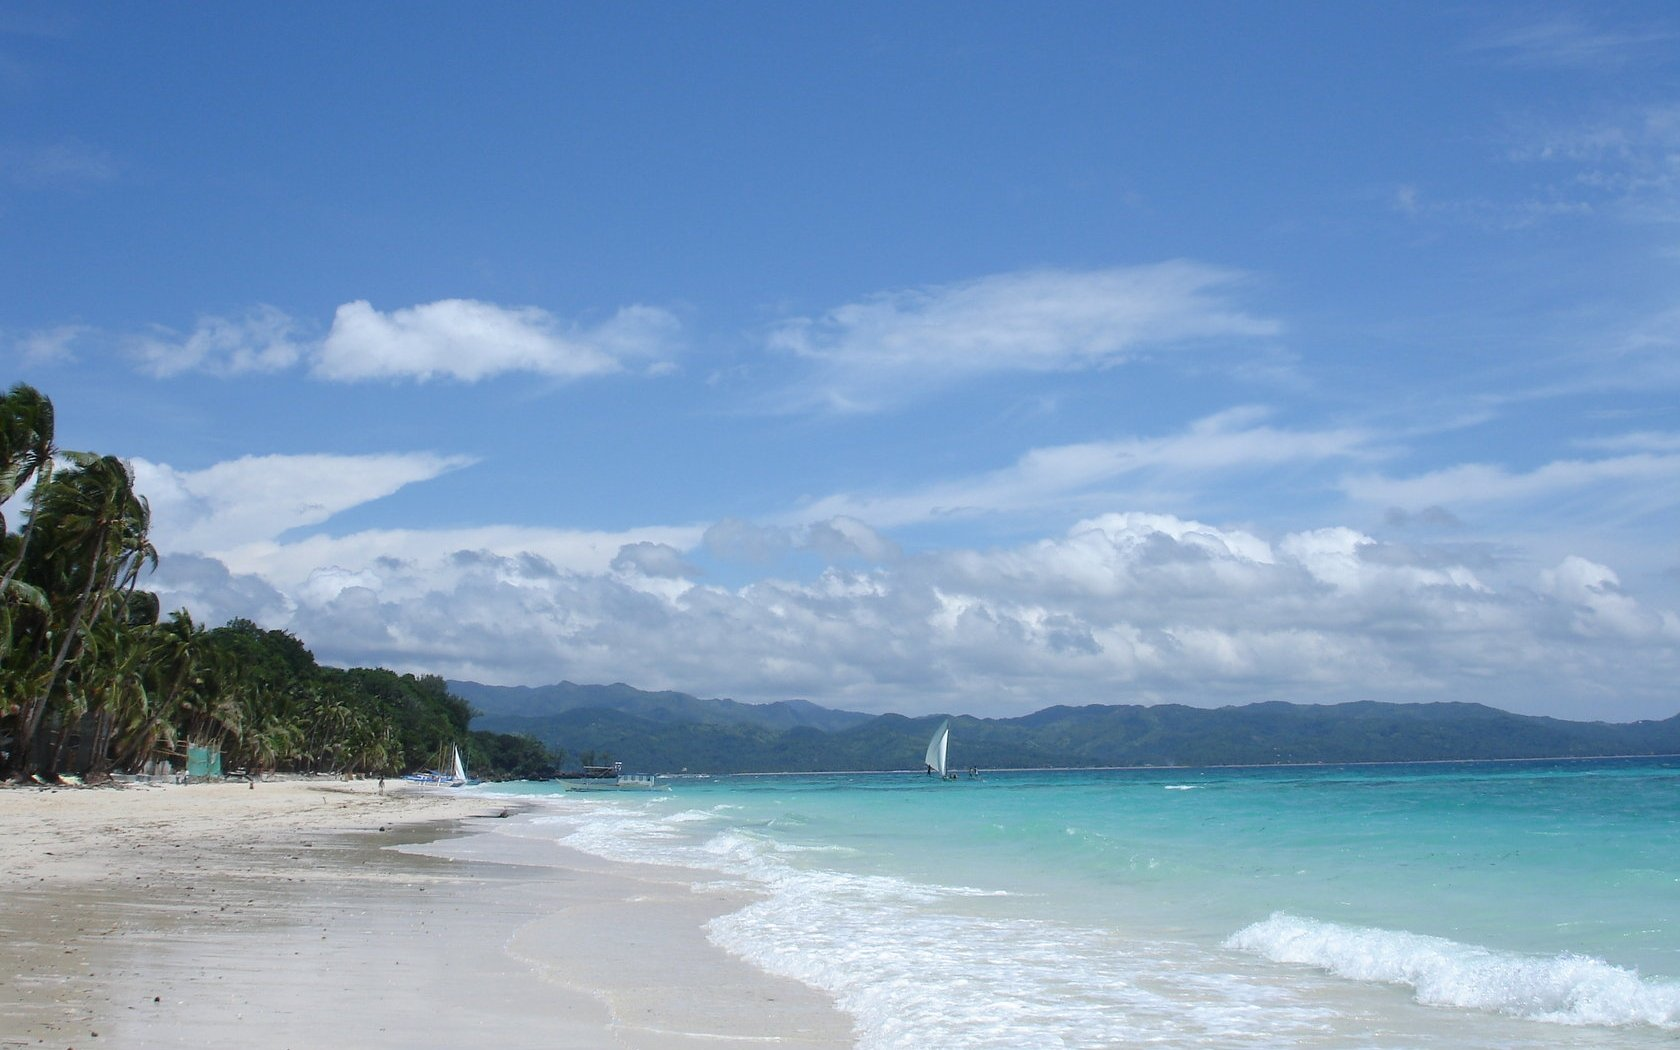 boracay beach hq wide - photo #20